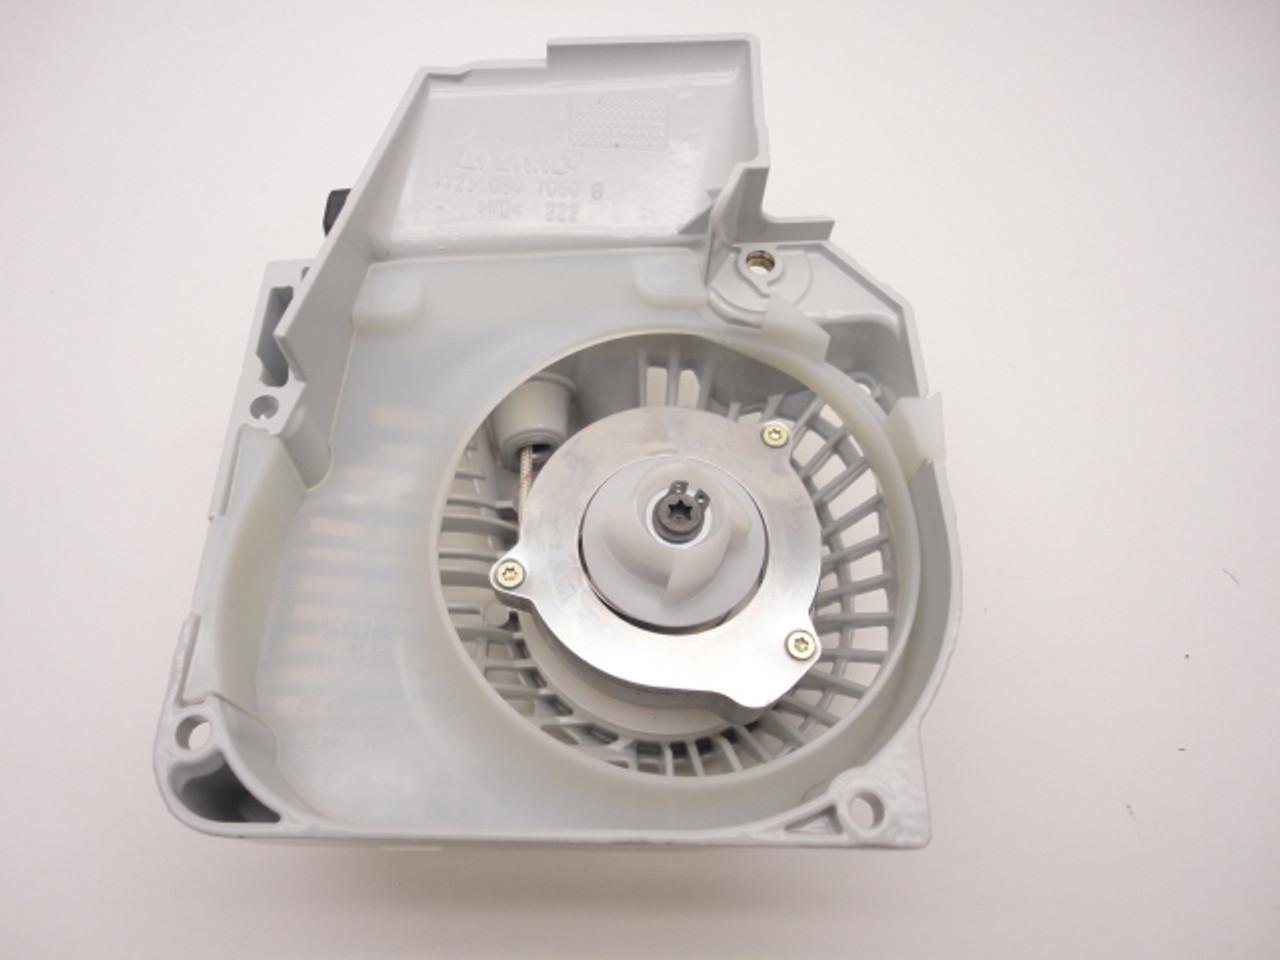 Stihl Ms 210 Ms 250 C-Be Easy Start Recoil Starter Assembly New Oem  11230802116